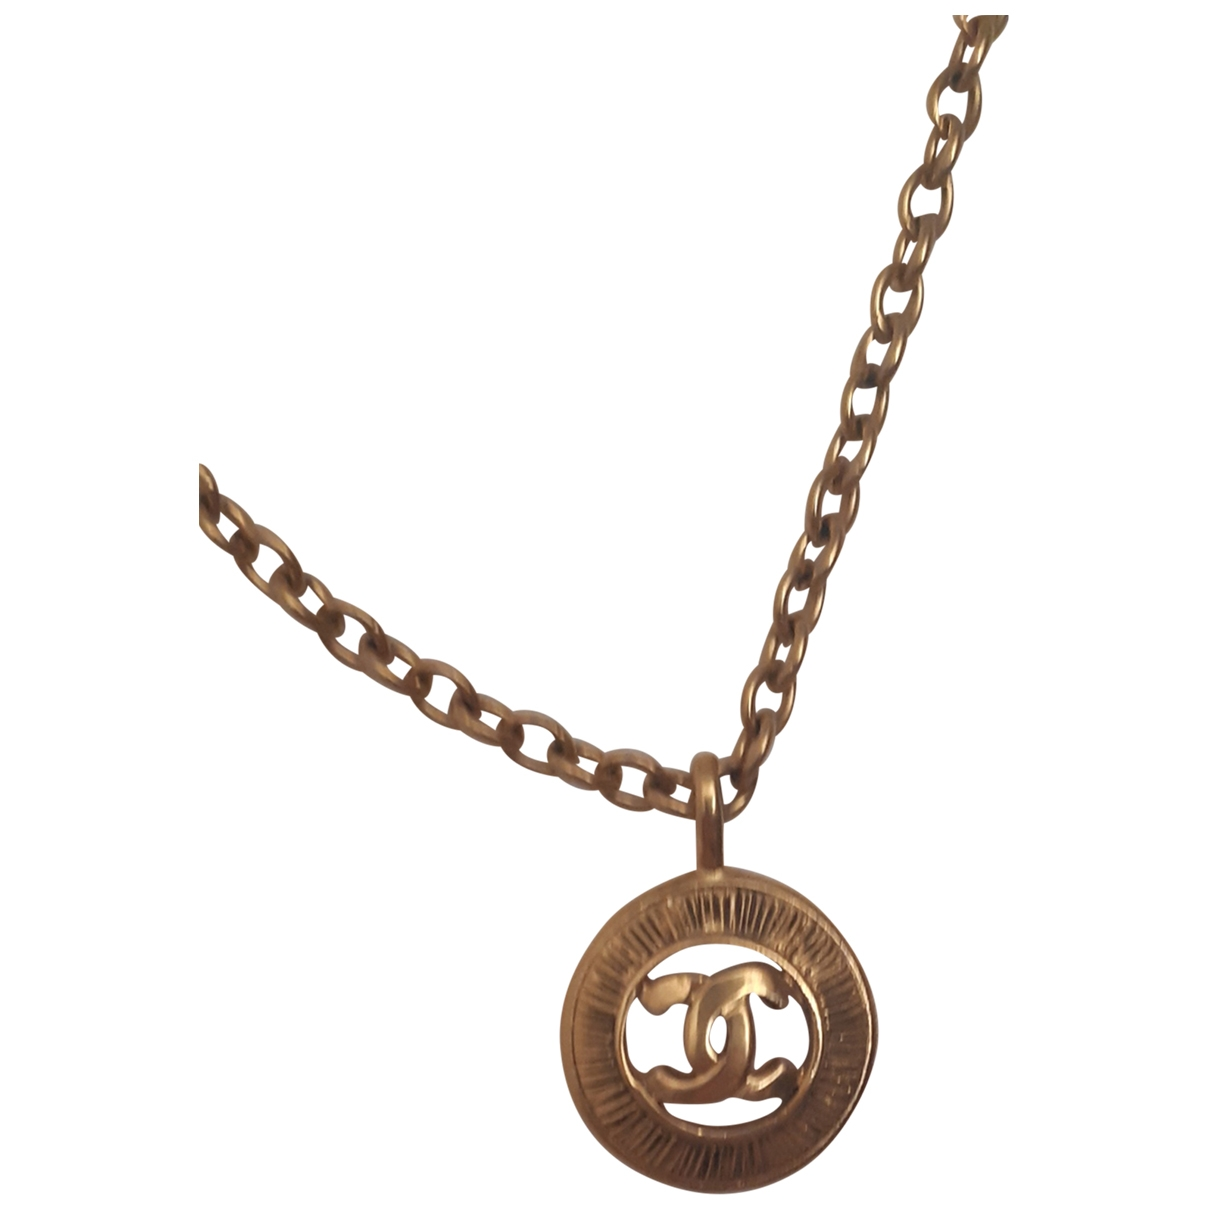 Collar Chanel X Pharrell Williams